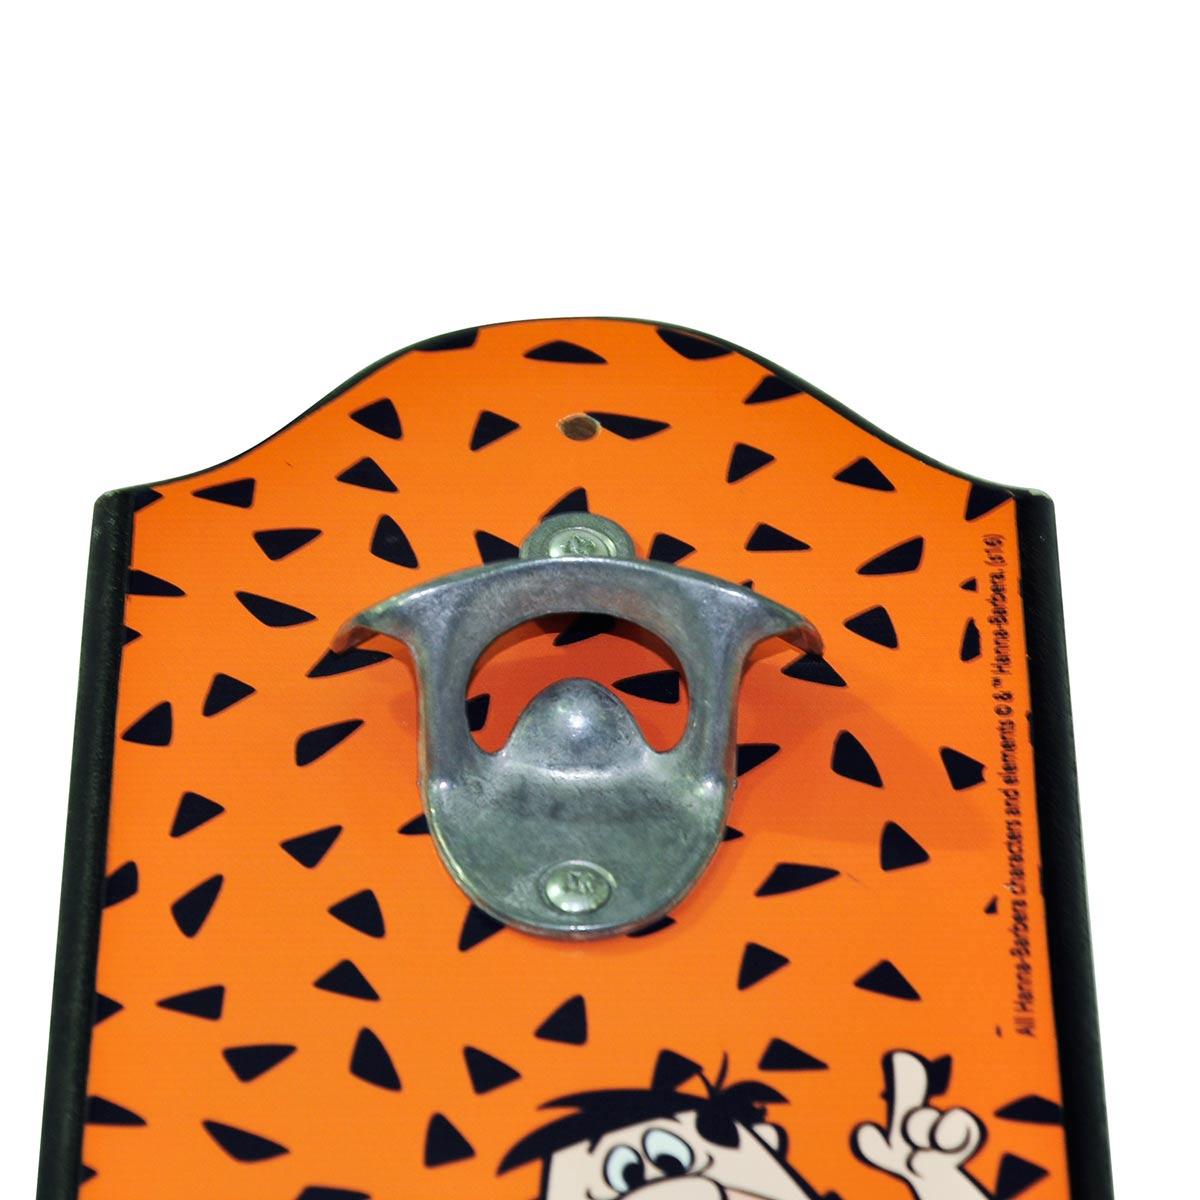 Abridor de Garrafas de Parede HB Os Flintstones